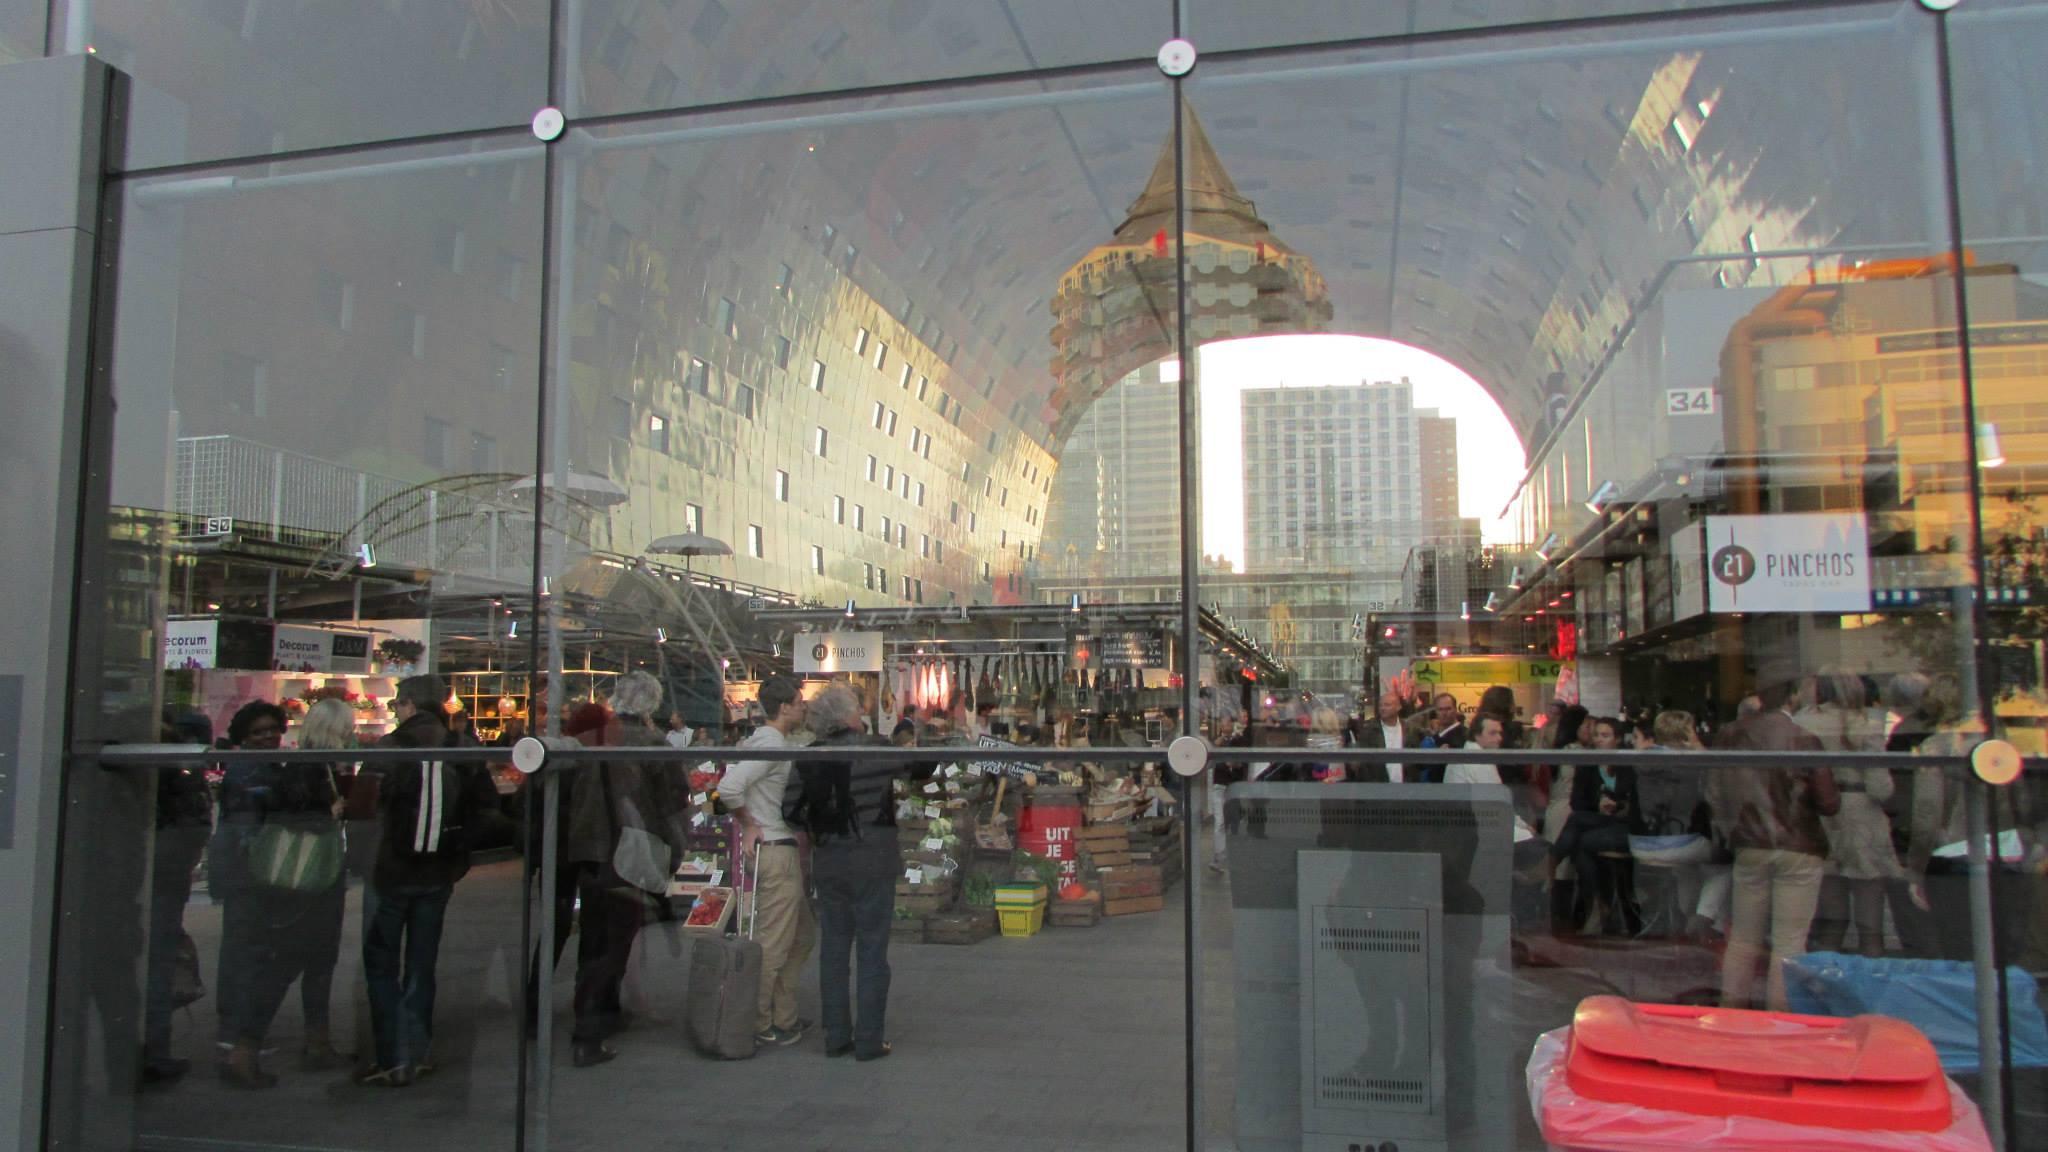 Markthal wordt druk bezocht